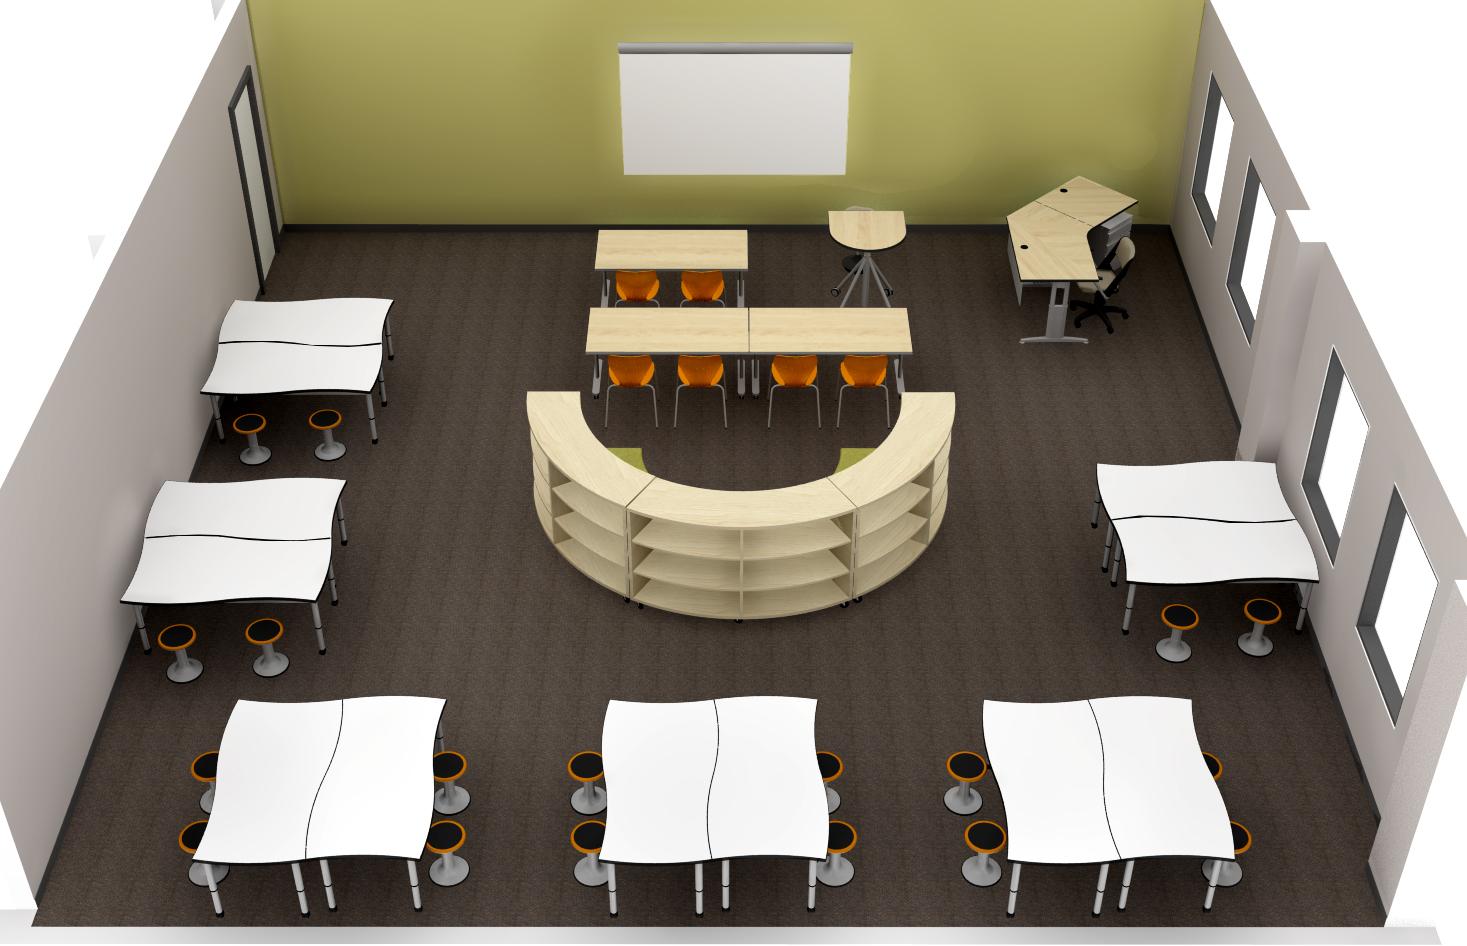 mien classroom 2.jpg